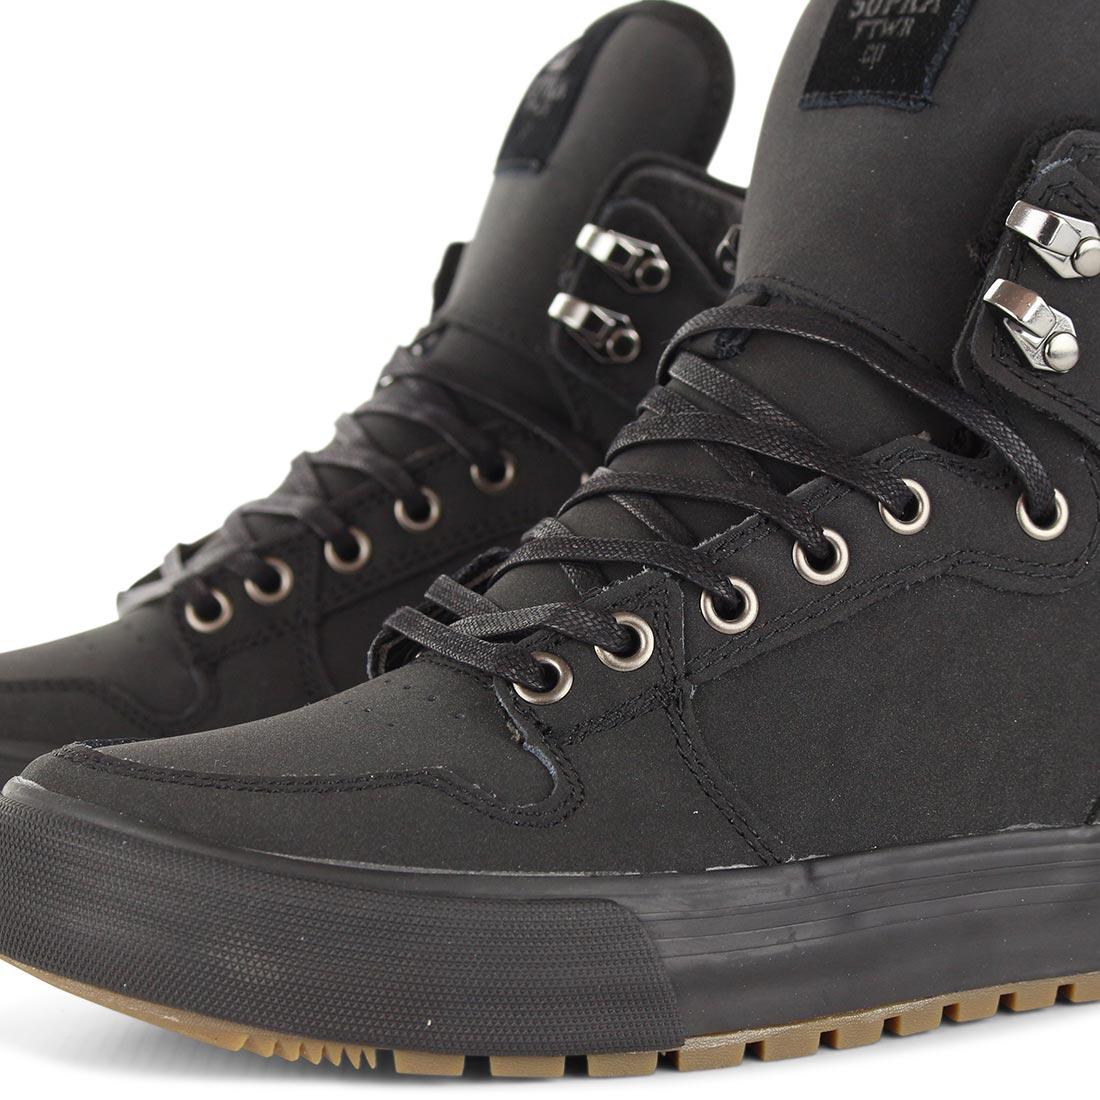 671ae7fb7dd6 ... Supra-Shoes-Vaider-CW-Black-Black-Dark-Gum ...